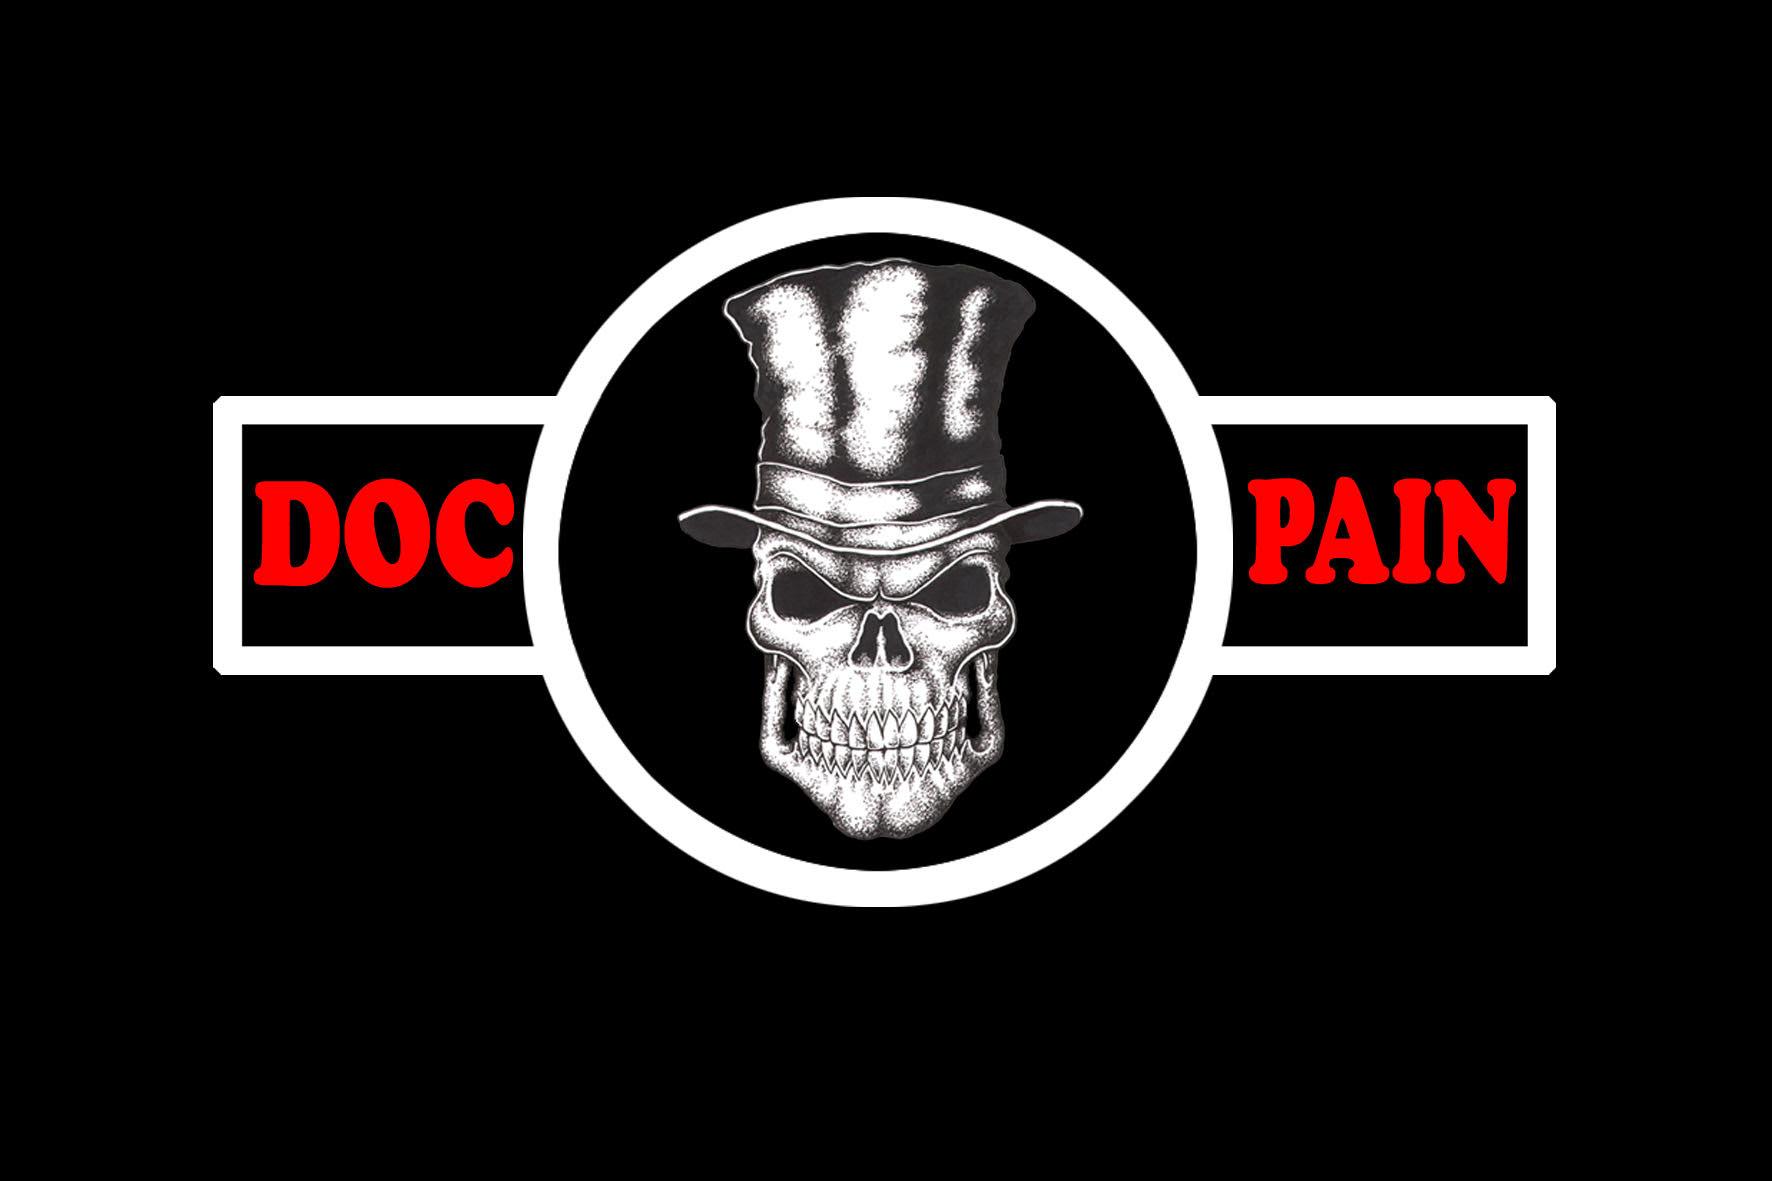 Doc pain logo